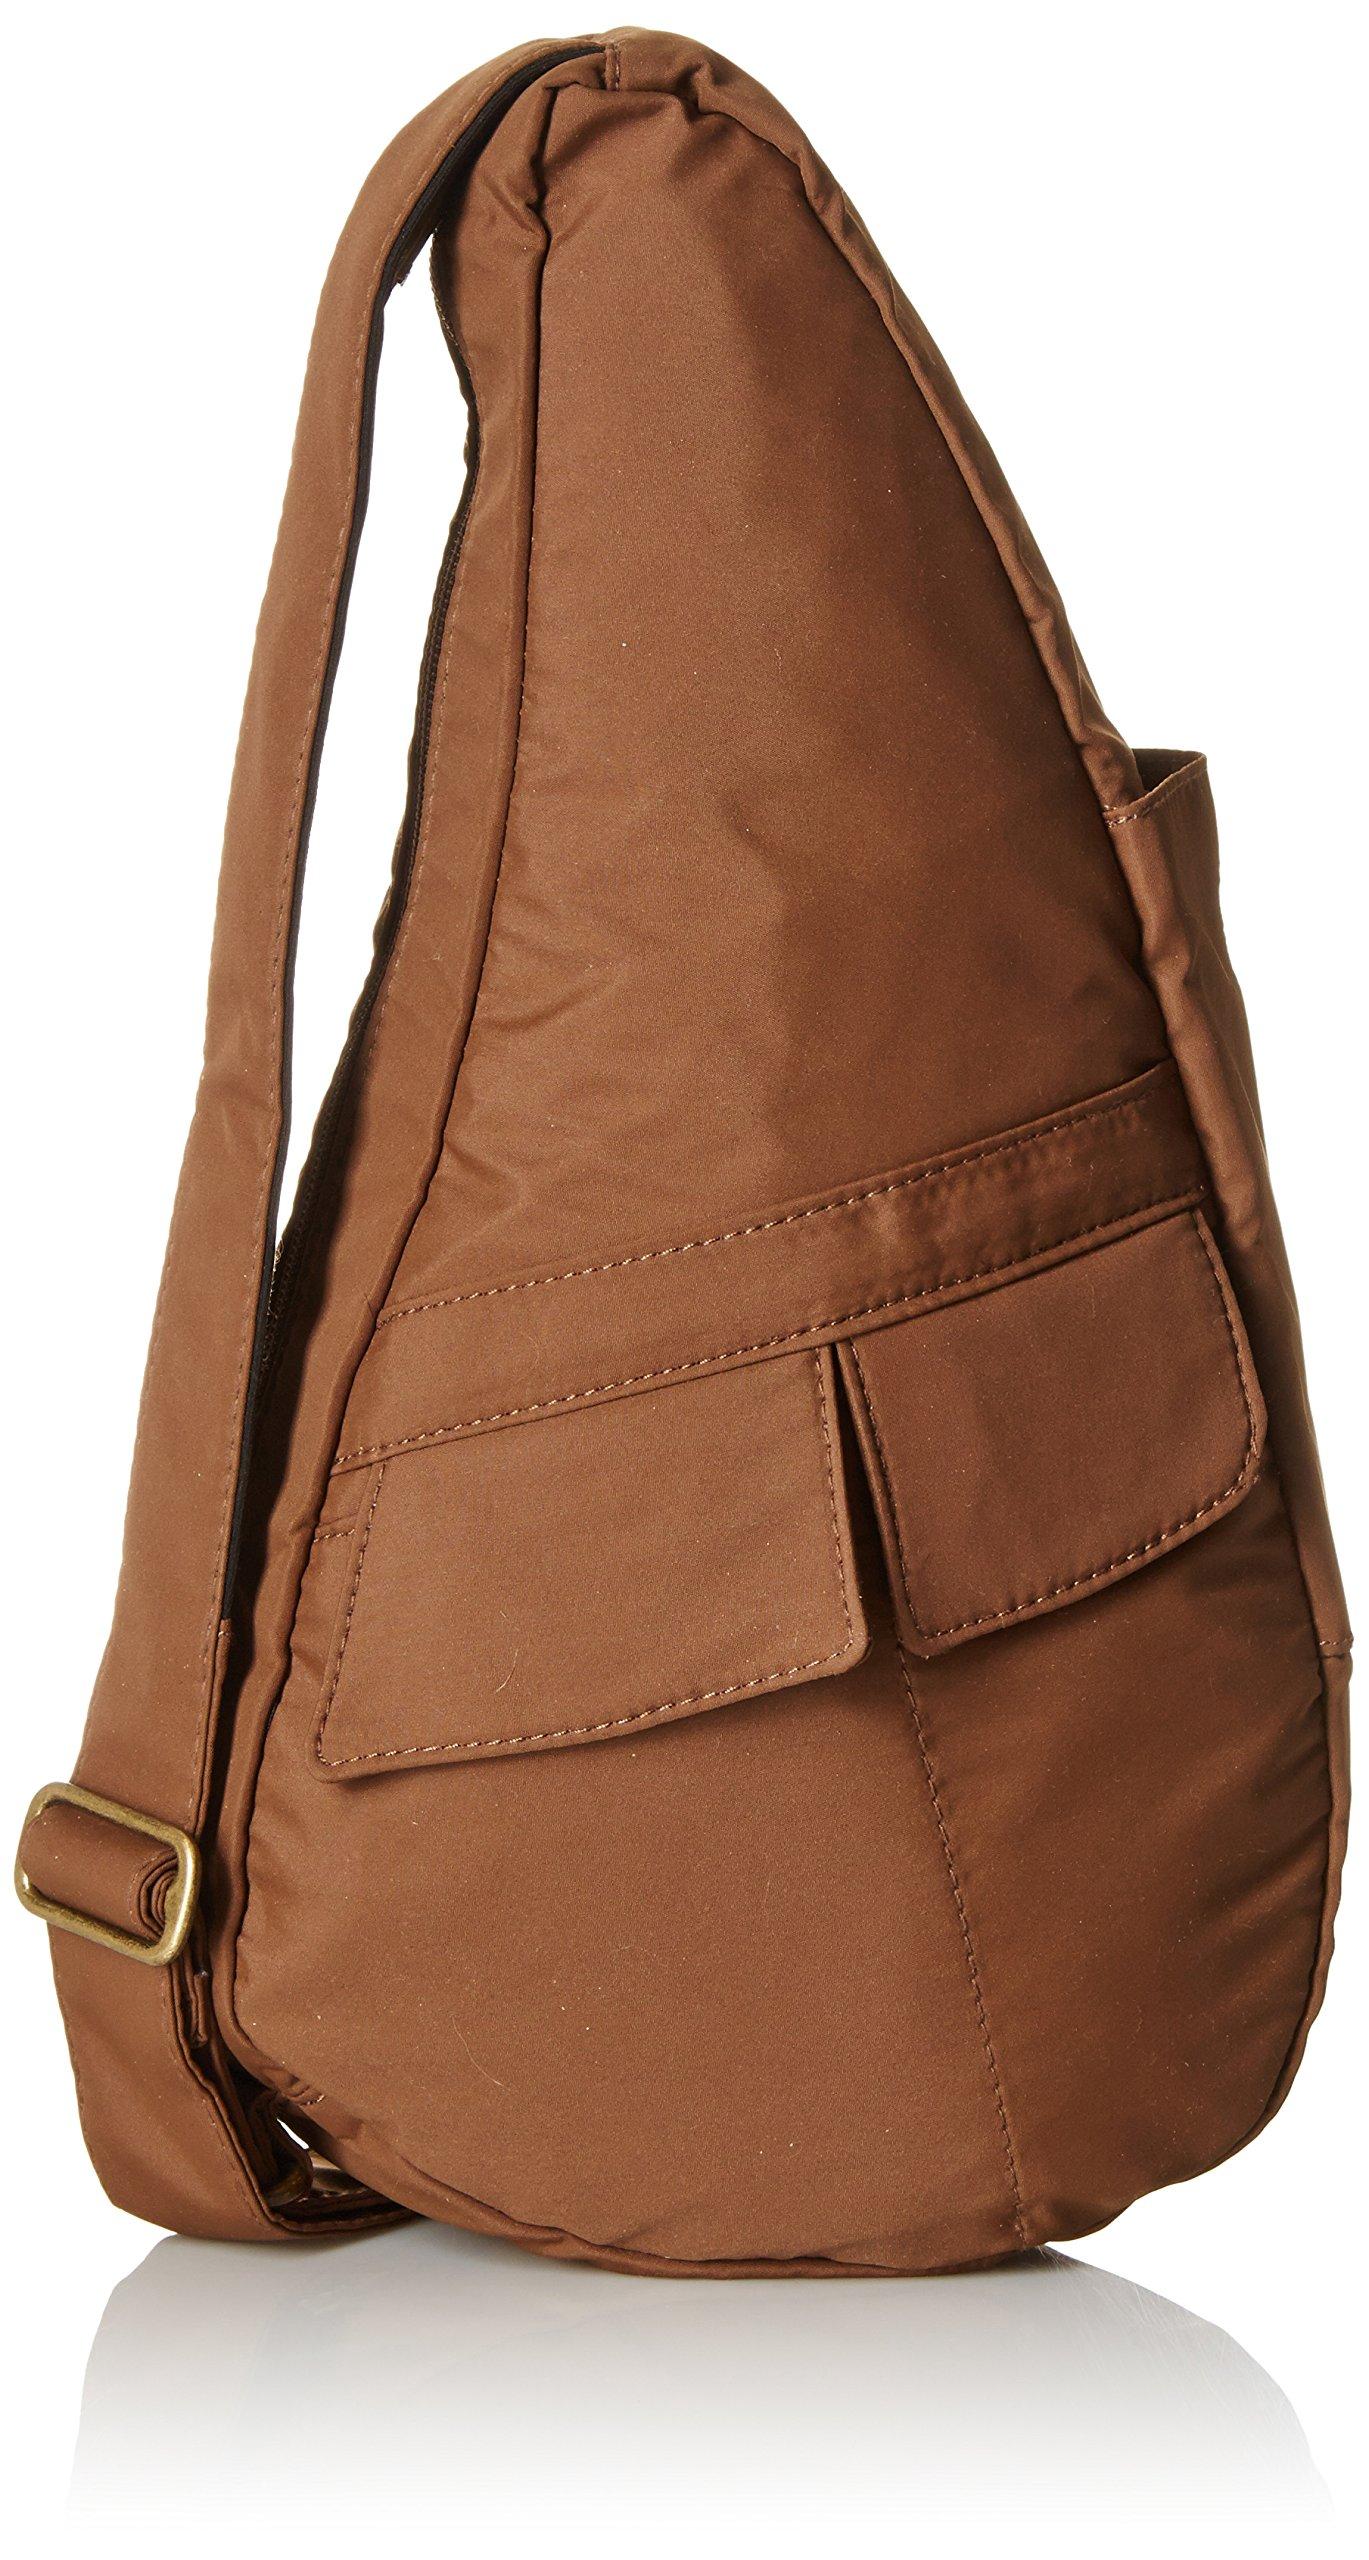 AmeriBag Classic Microfiber Healthy Back Bag tHandbag X-Small,Taupe,one size